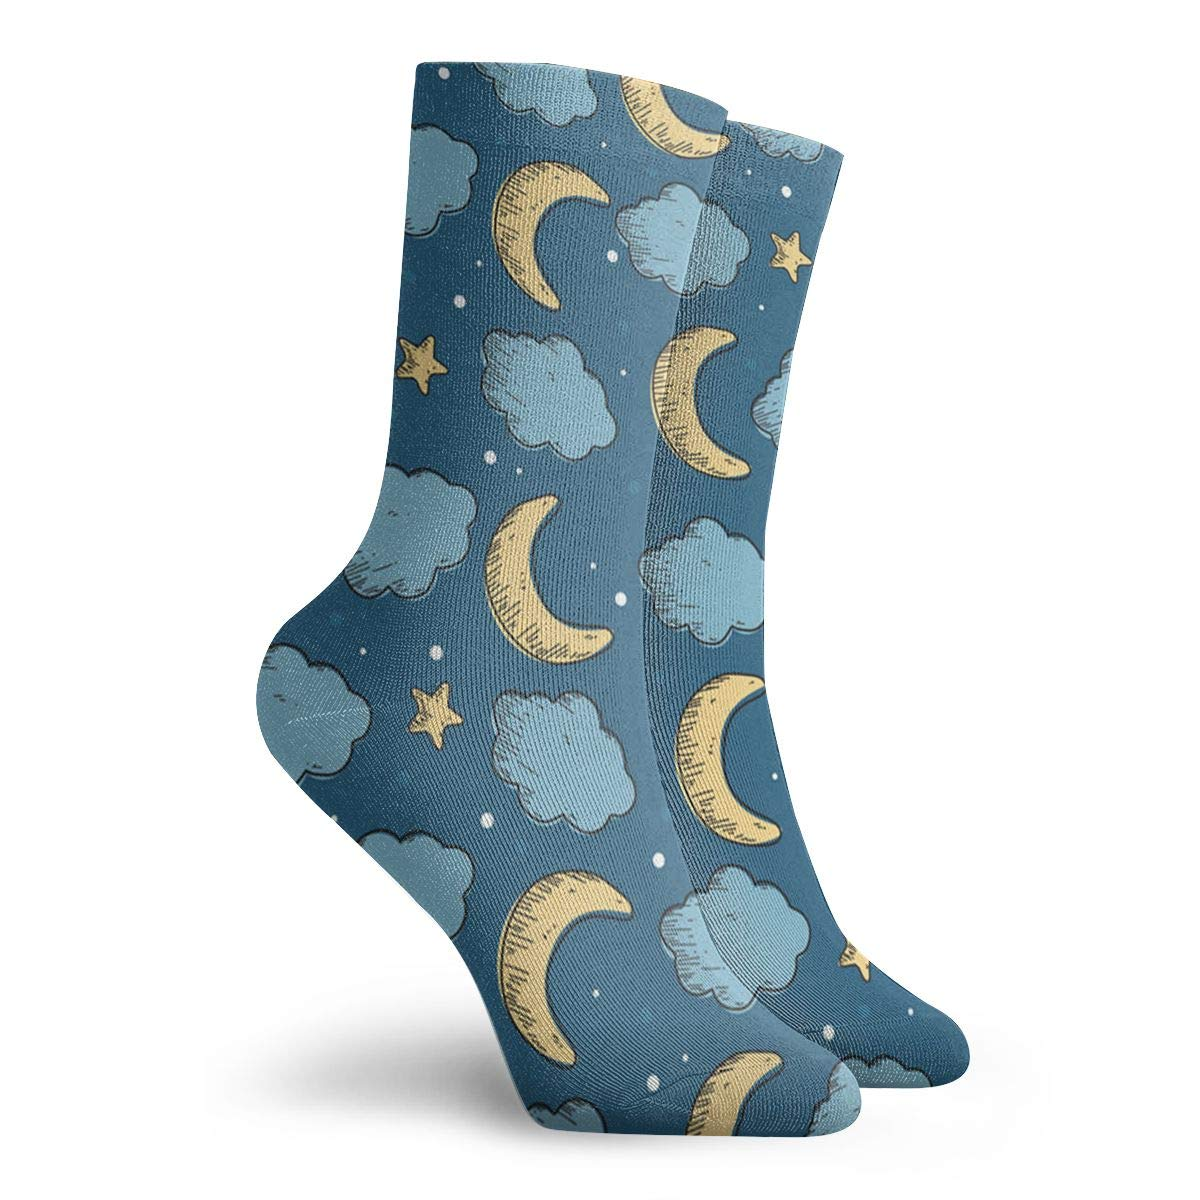 Moon-Star Unisex Funny Casual Crew Socks Athletic Socks For Boys Girls Kids Teenagers